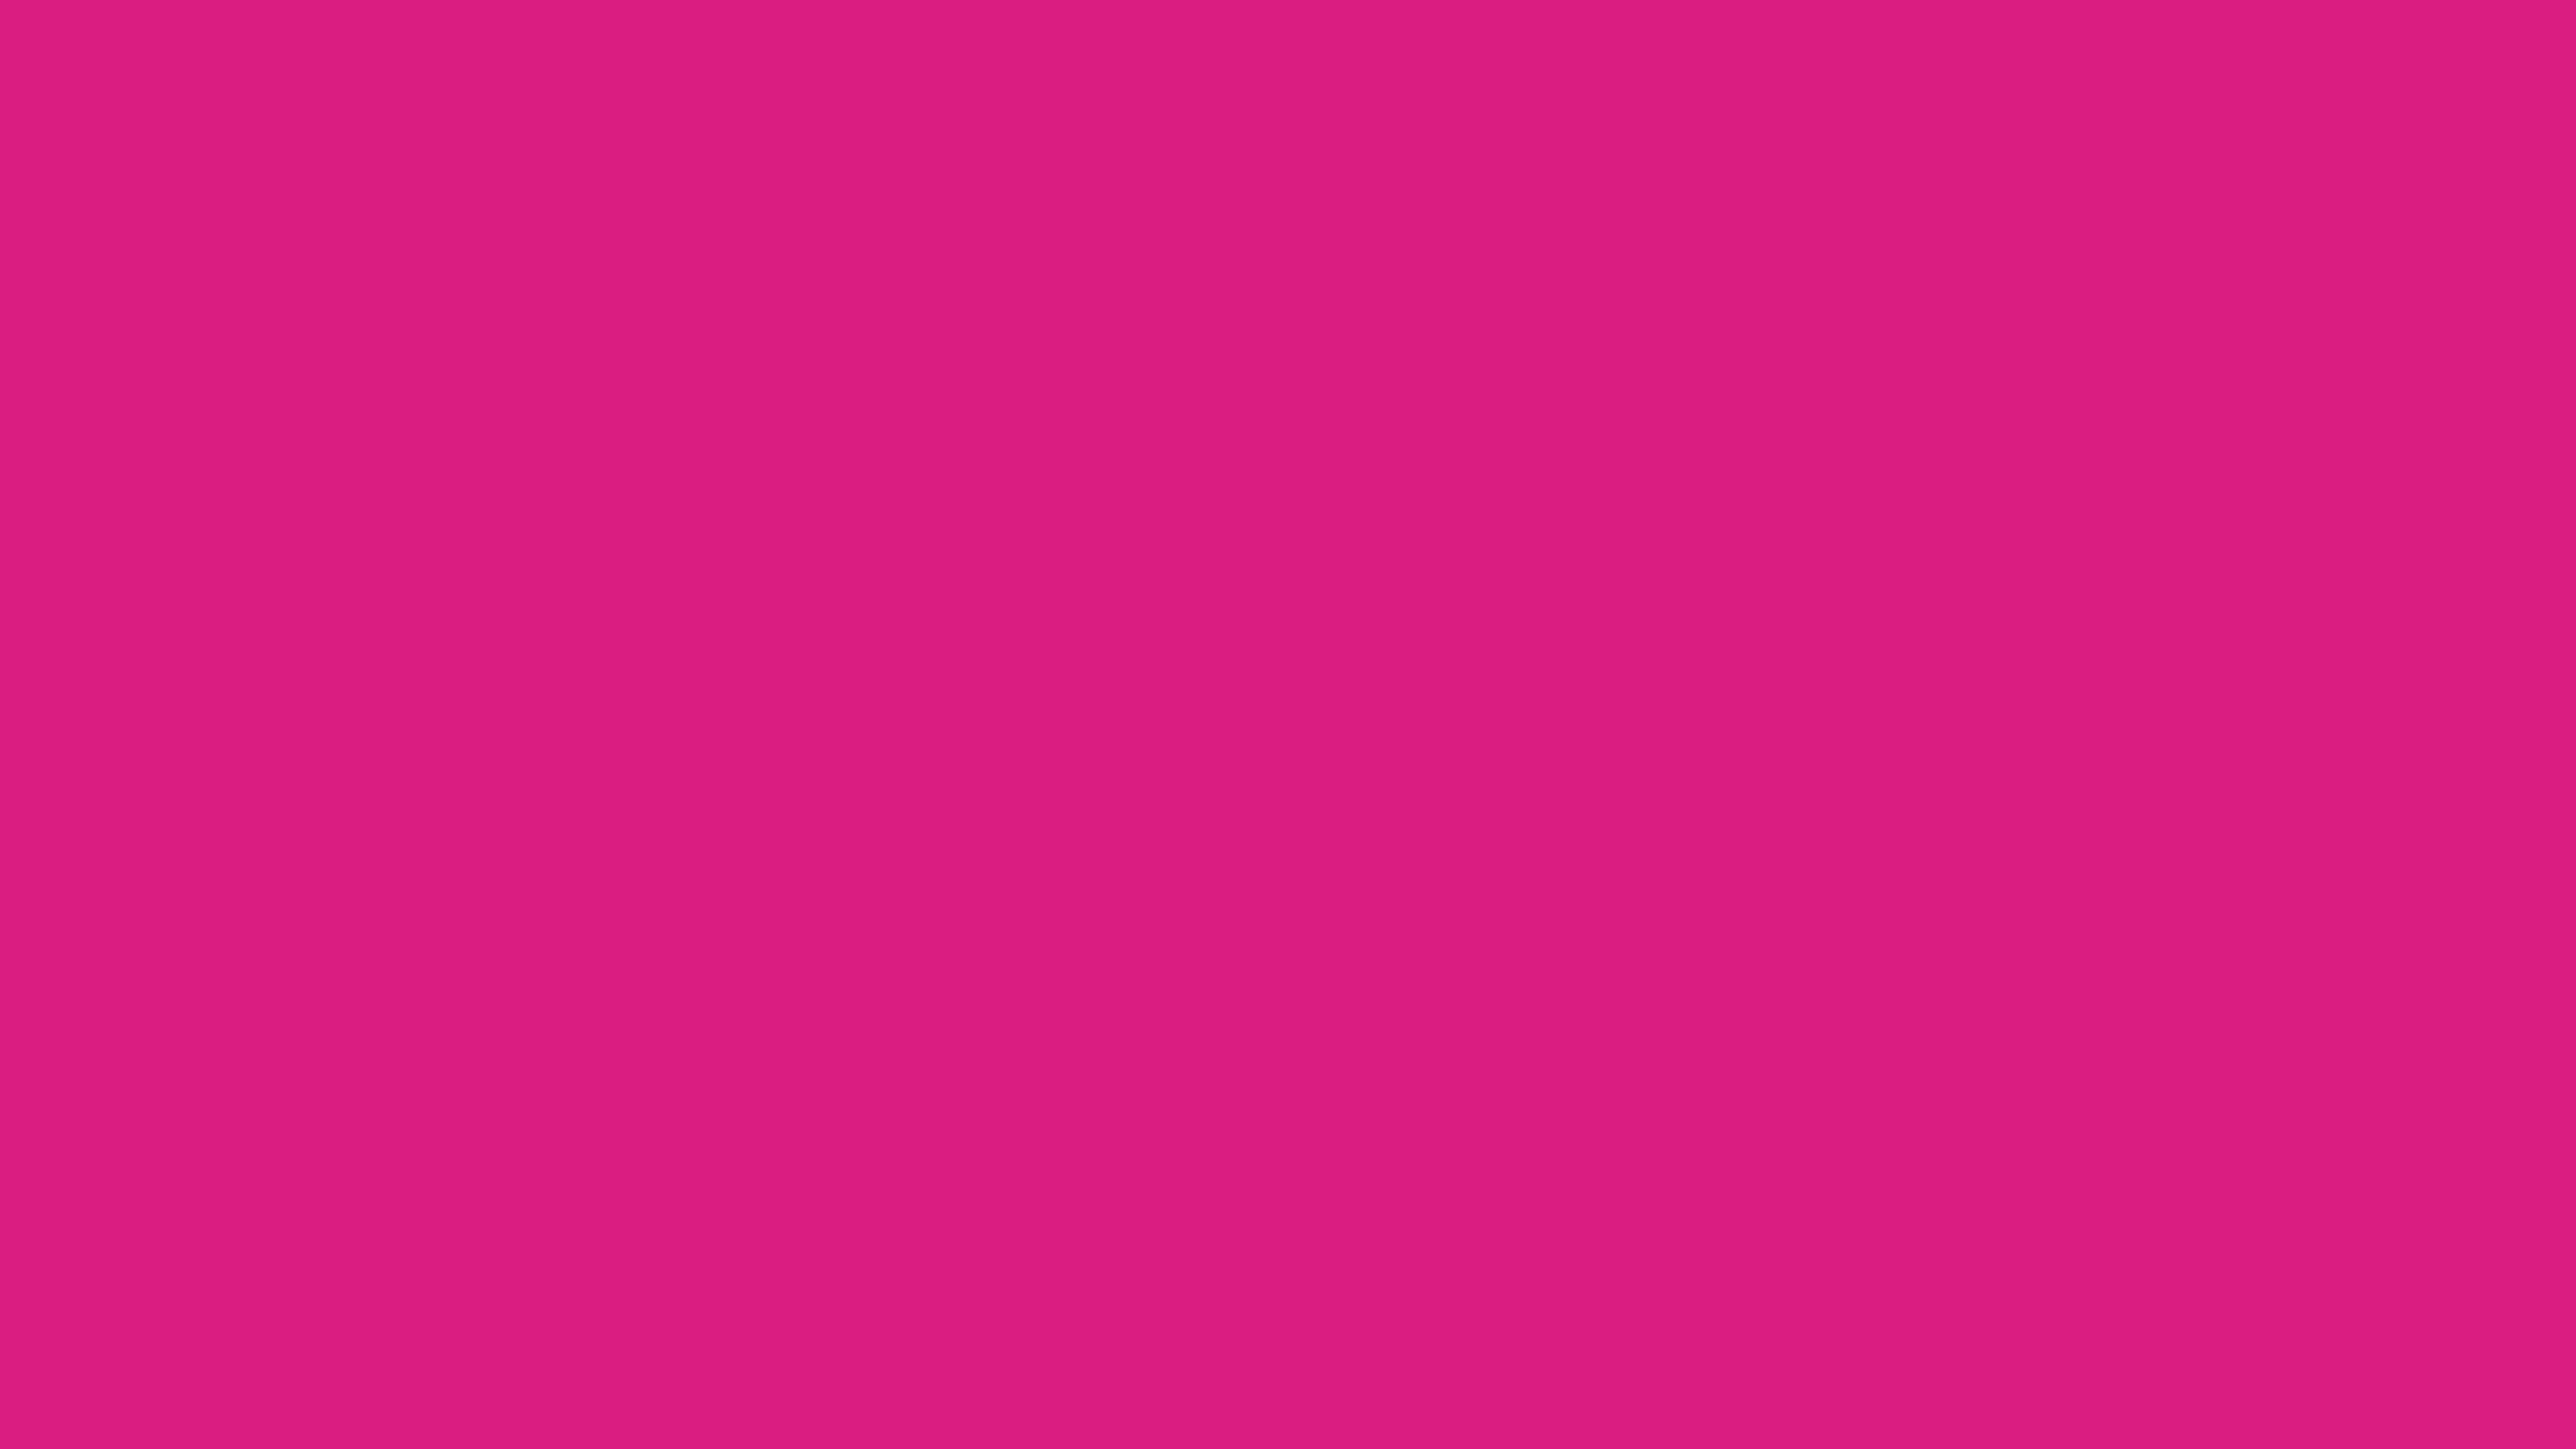 4096x2304 Vivid Cerise Solid Color Background